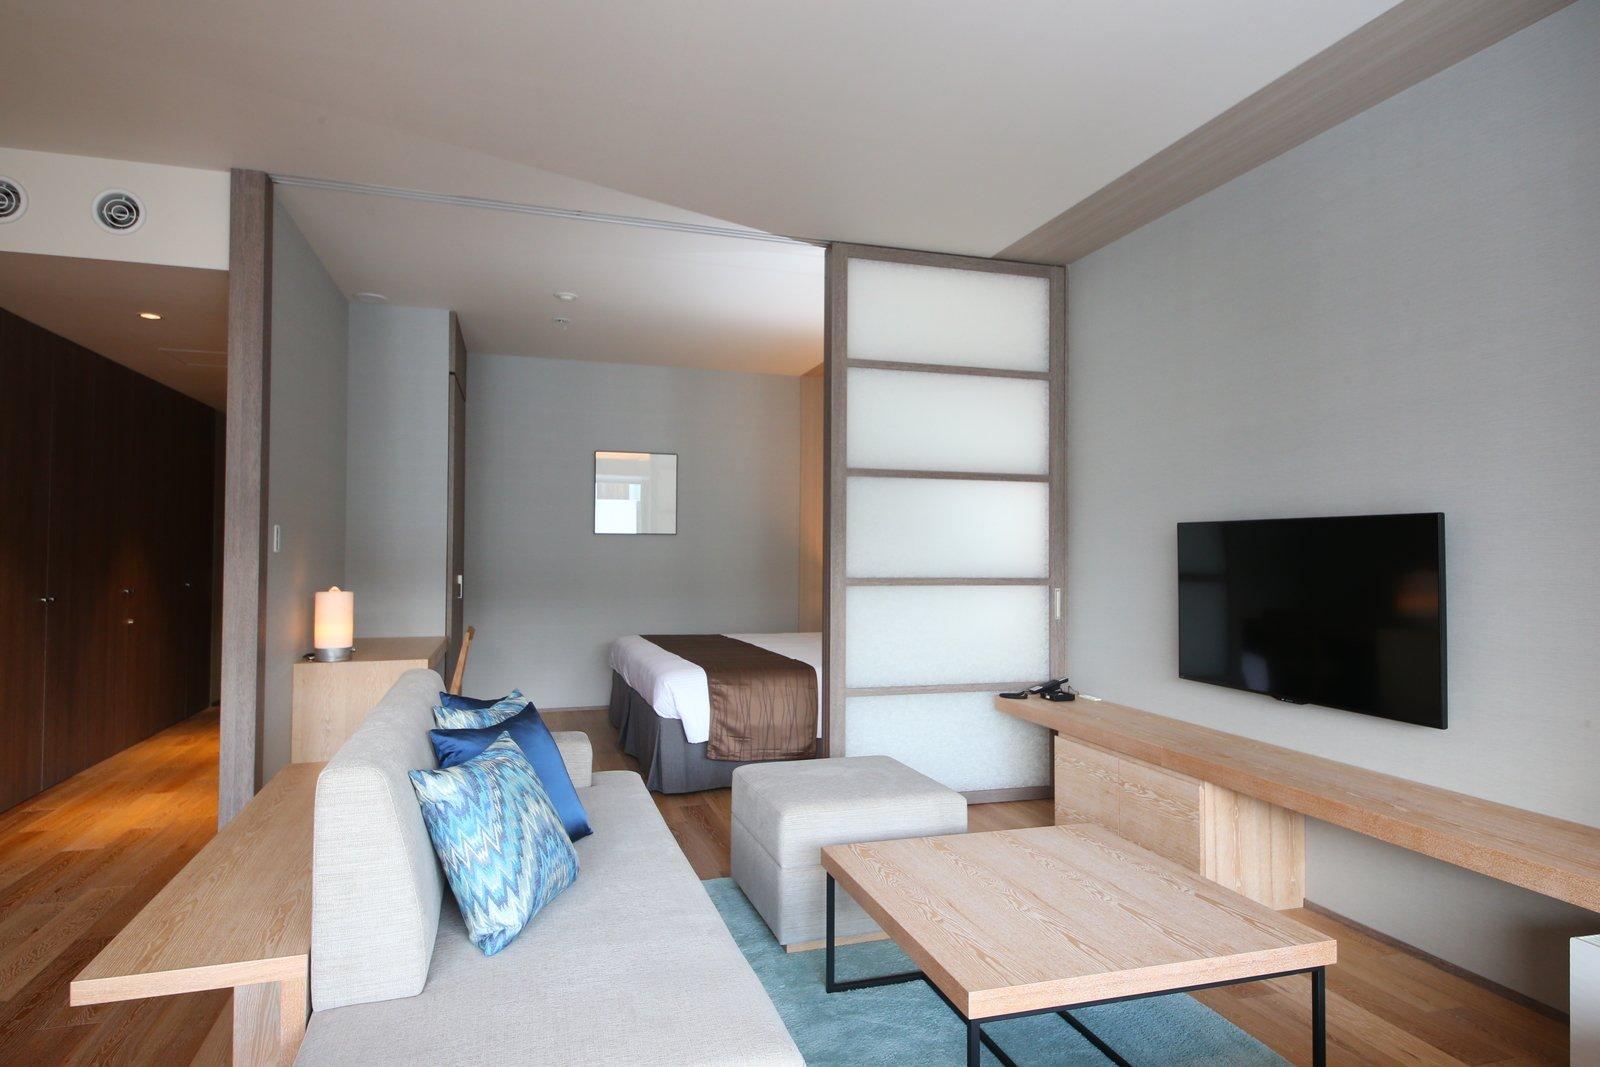 1 5 bedroom 4 large